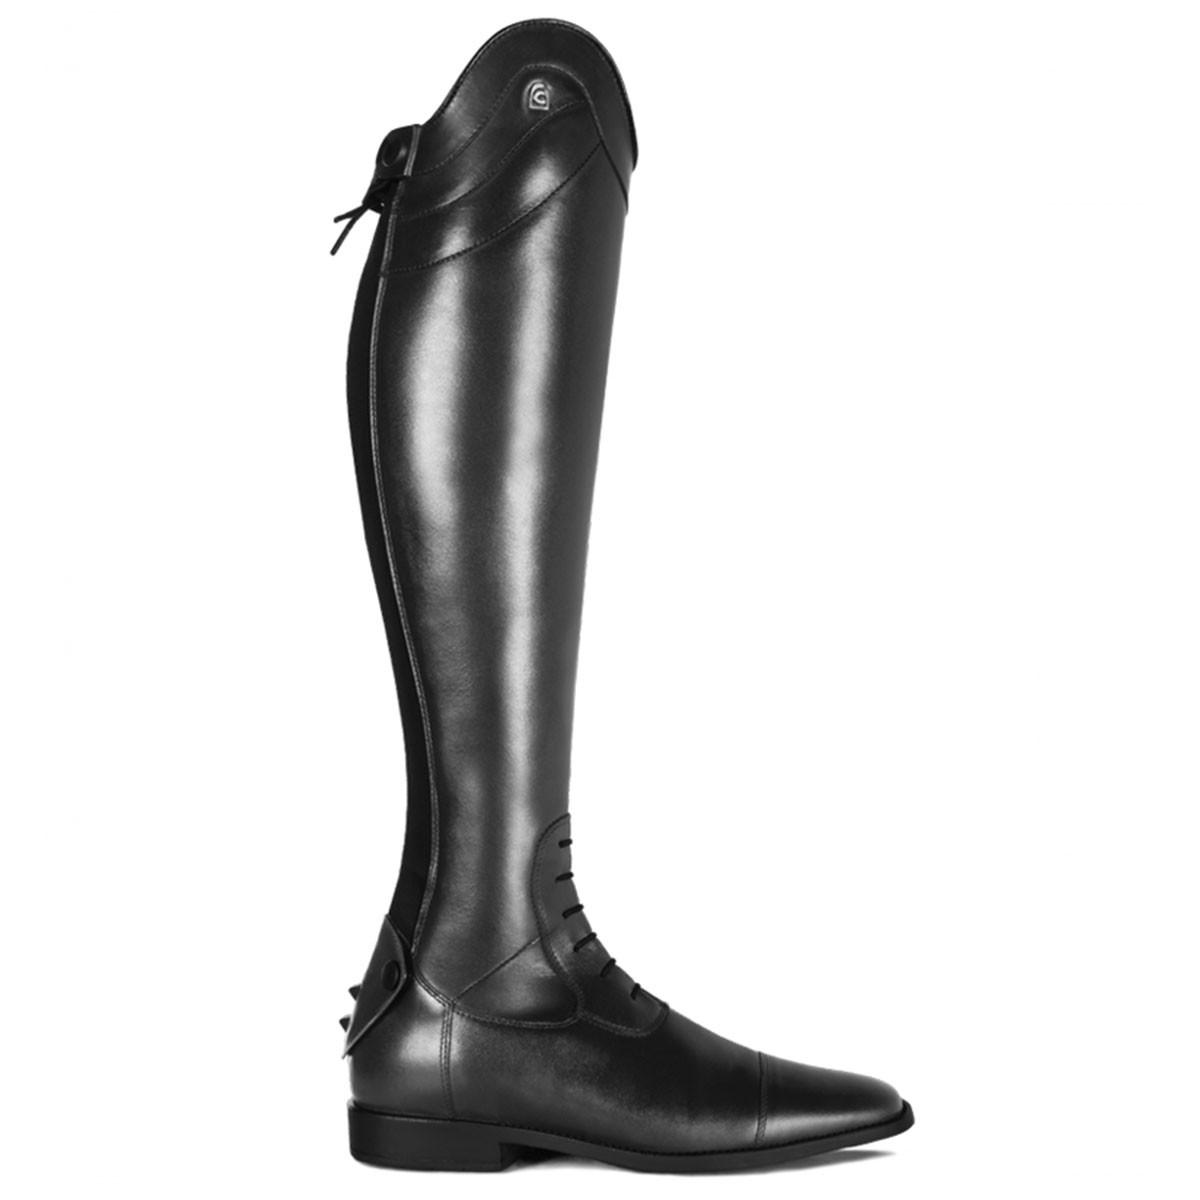 Cavallo Linus Slim rijlaars zwart maat:6-6.5 / h48-w35